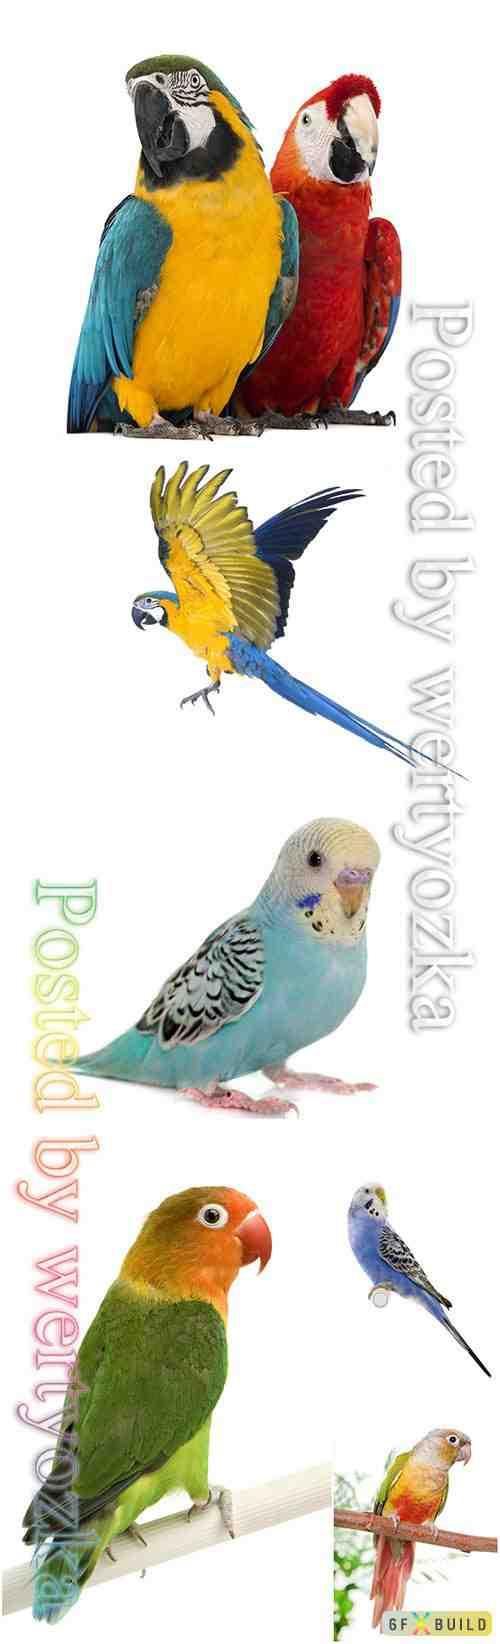 Parrots beautiful stock photo